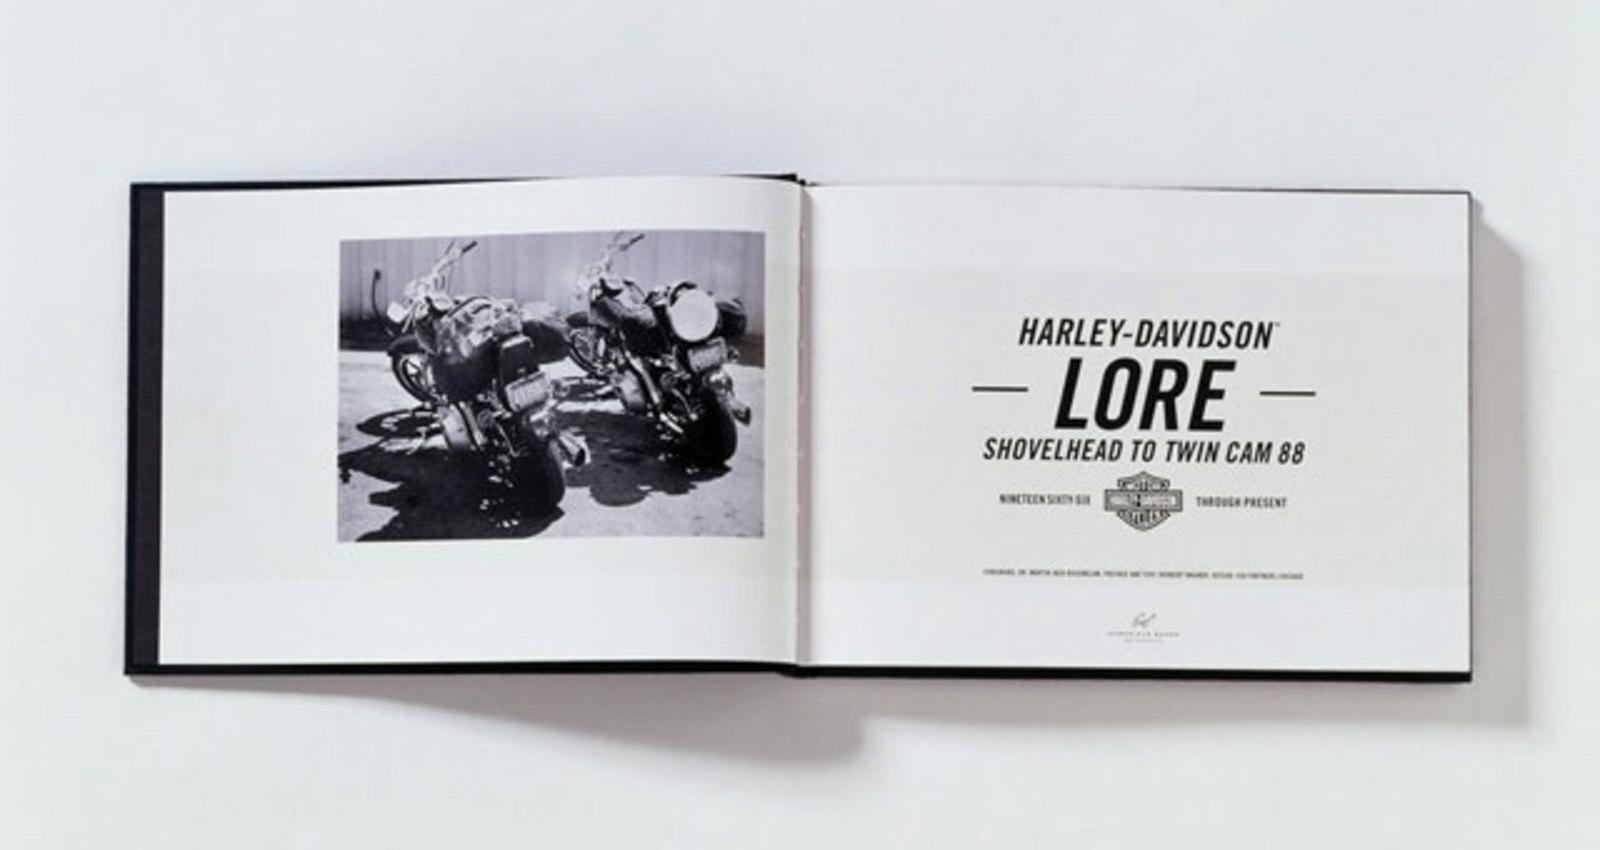 Harley-Davidson LORE: 1966-Present